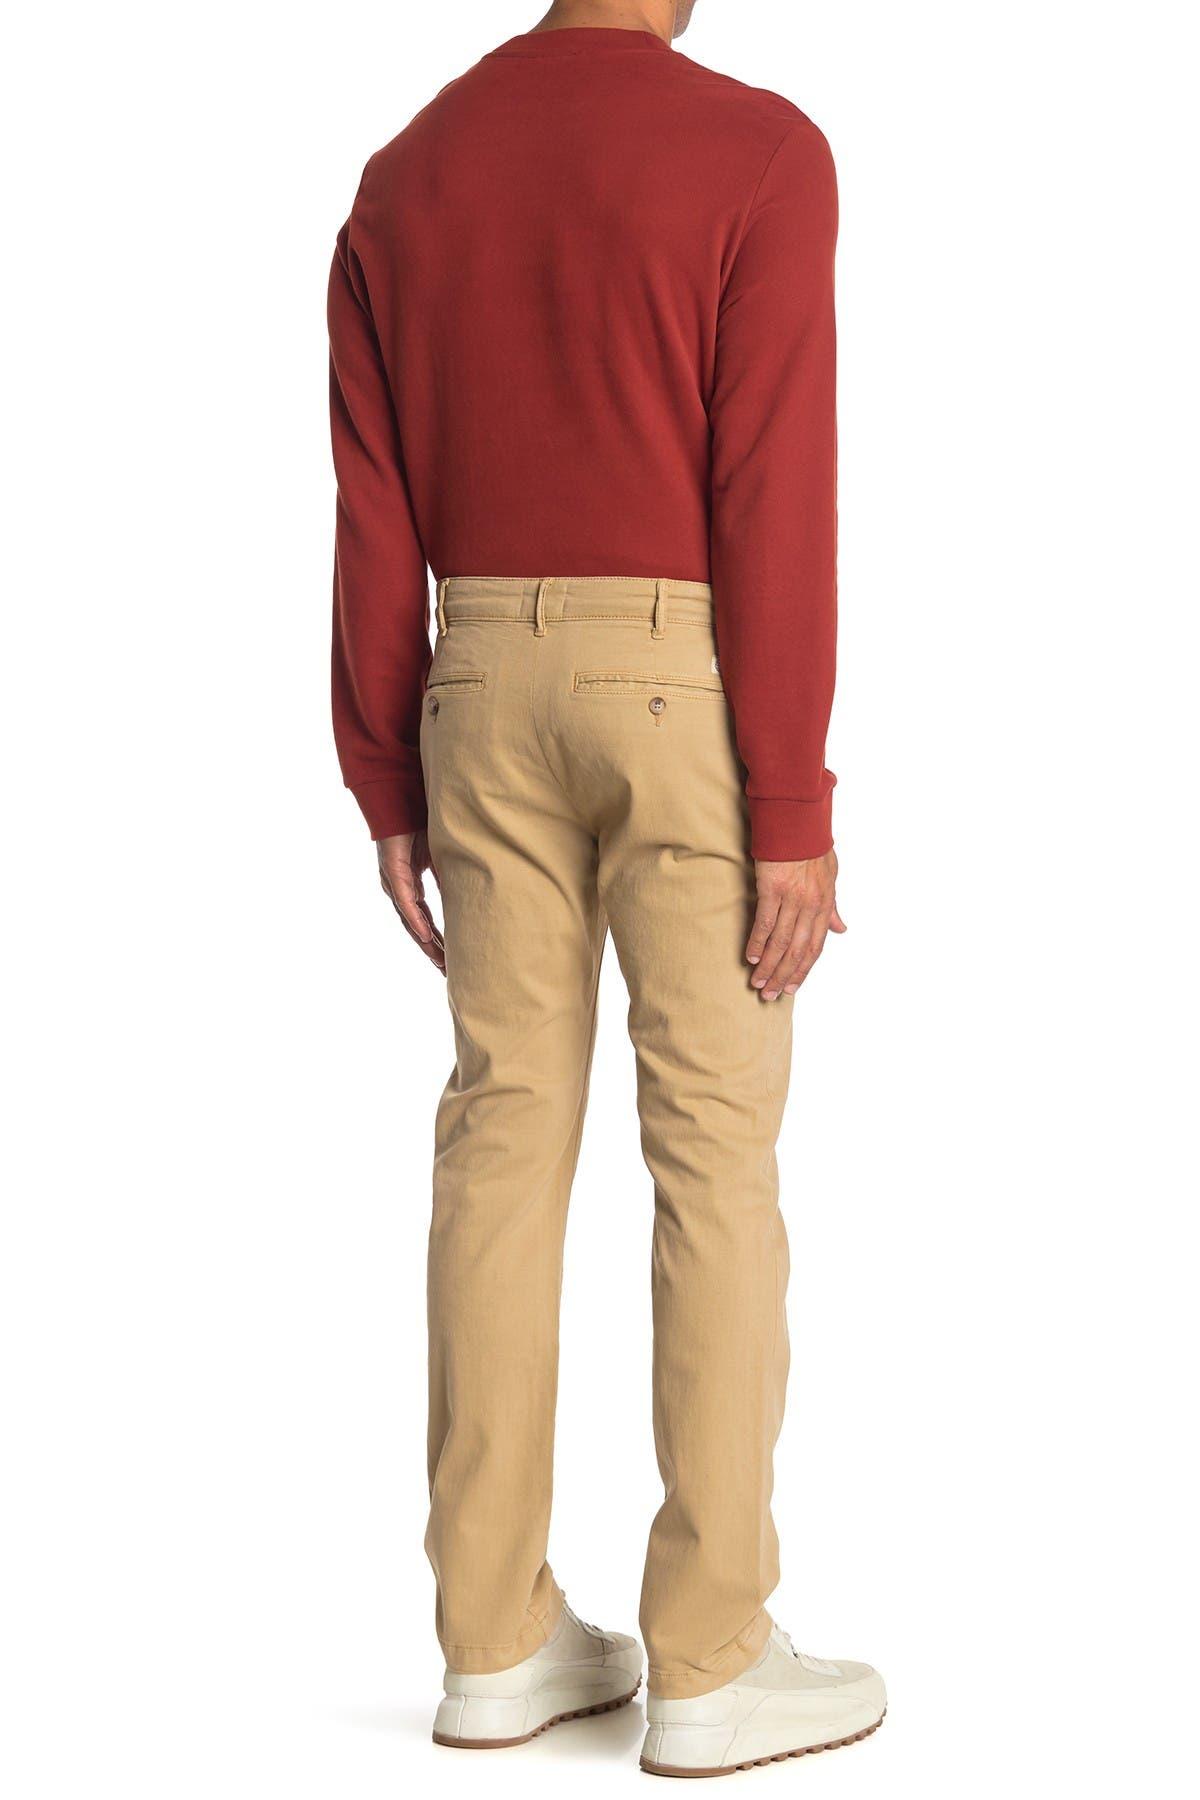 Image of Marine Layer Solid Walk Pants